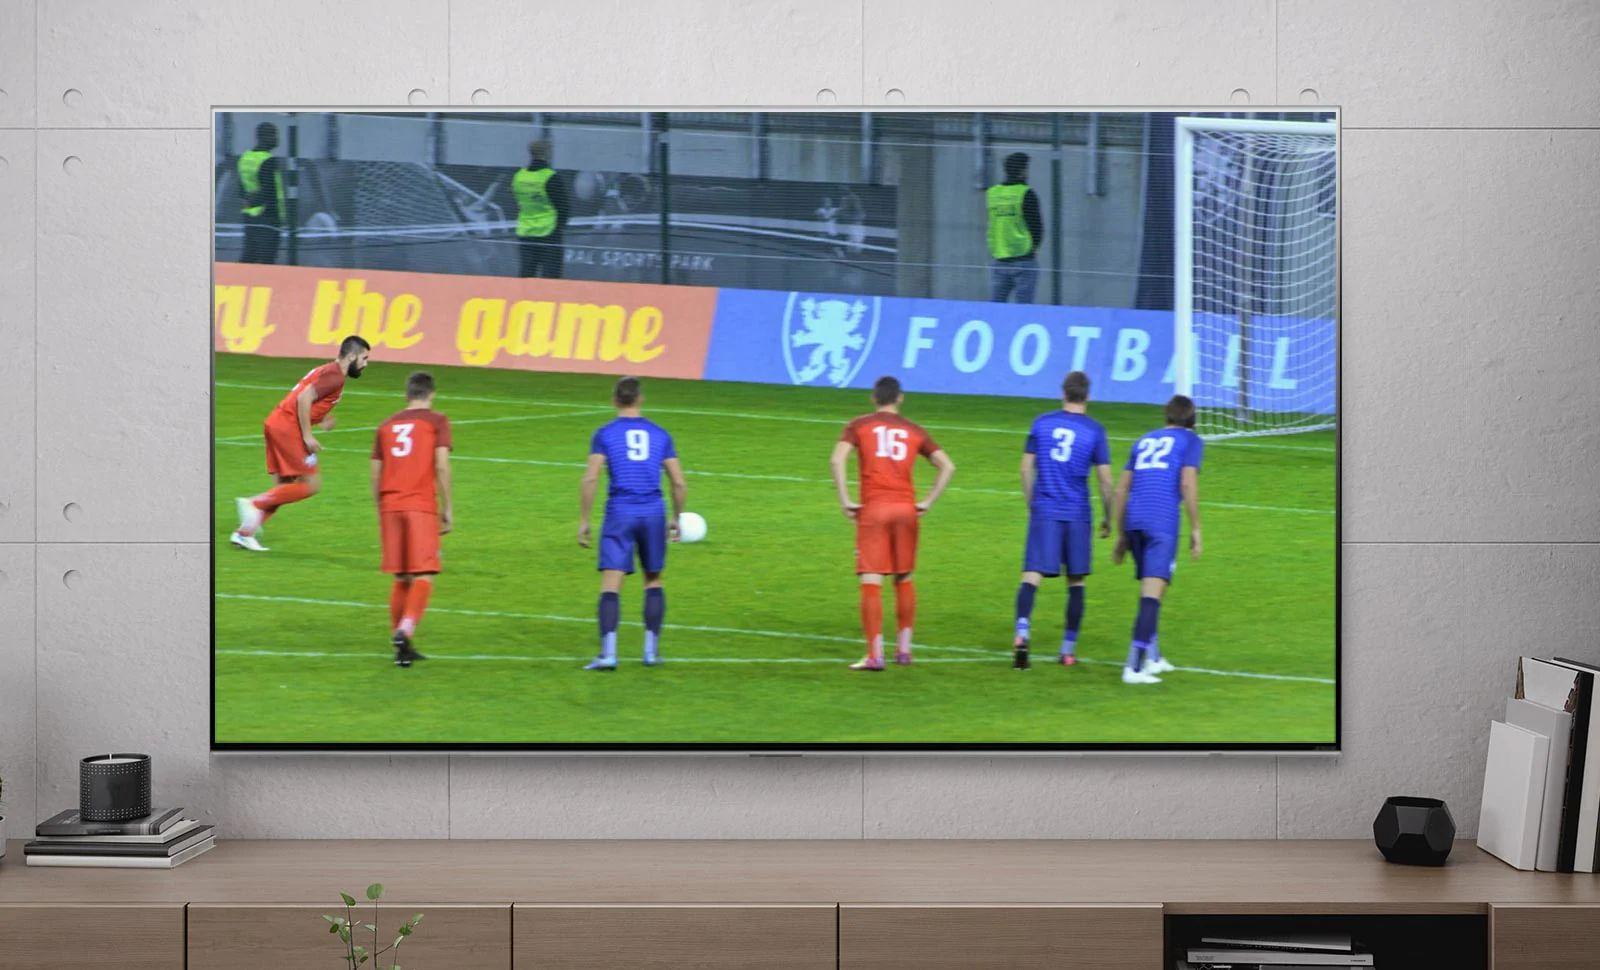 Teleriekraan, kus jalgpallur lööb penalti (esita video).